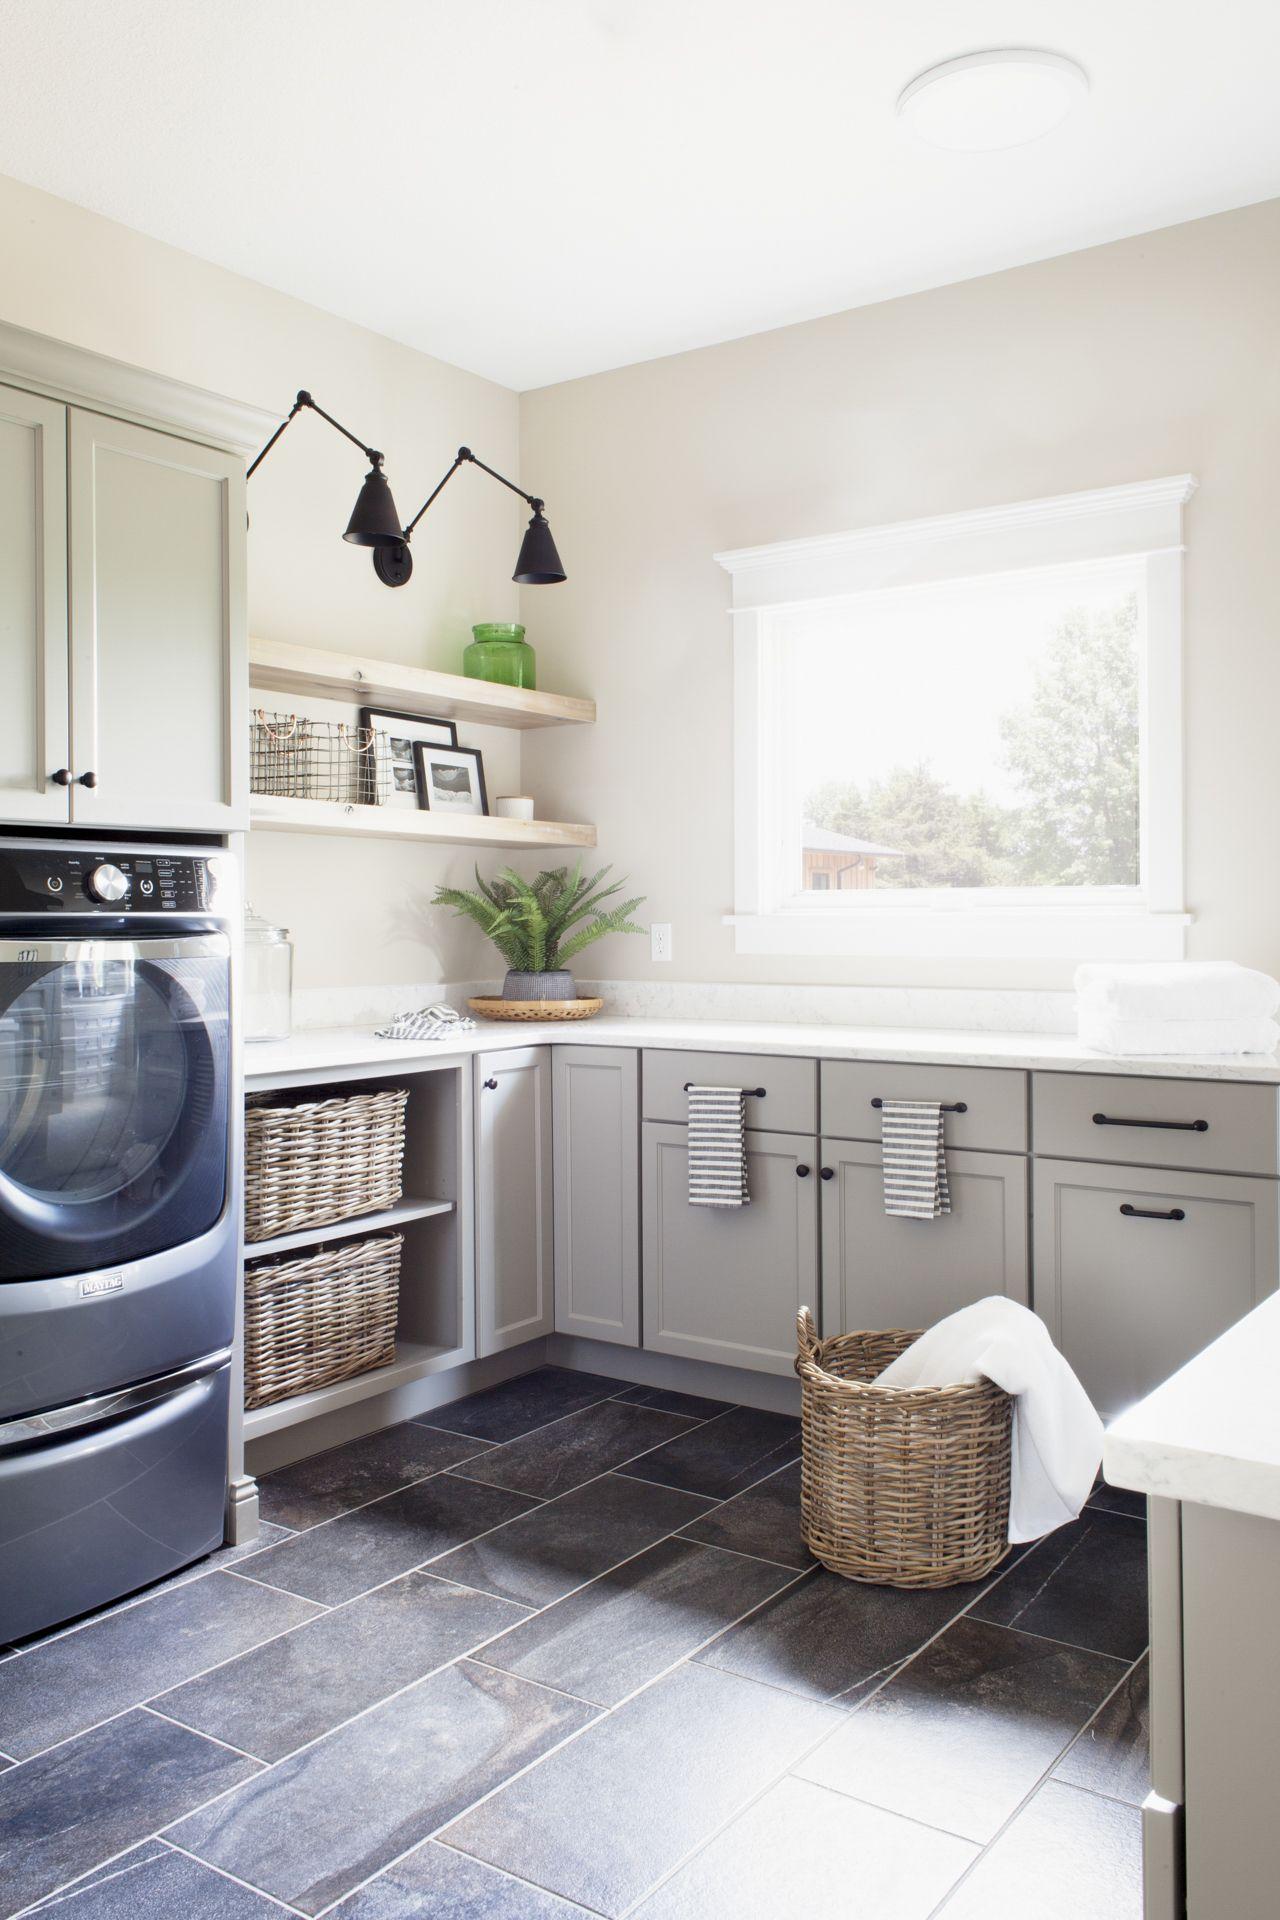 Kitchen Laundry Room Design: Laundry Room Design, Laundry Room Decor Diy